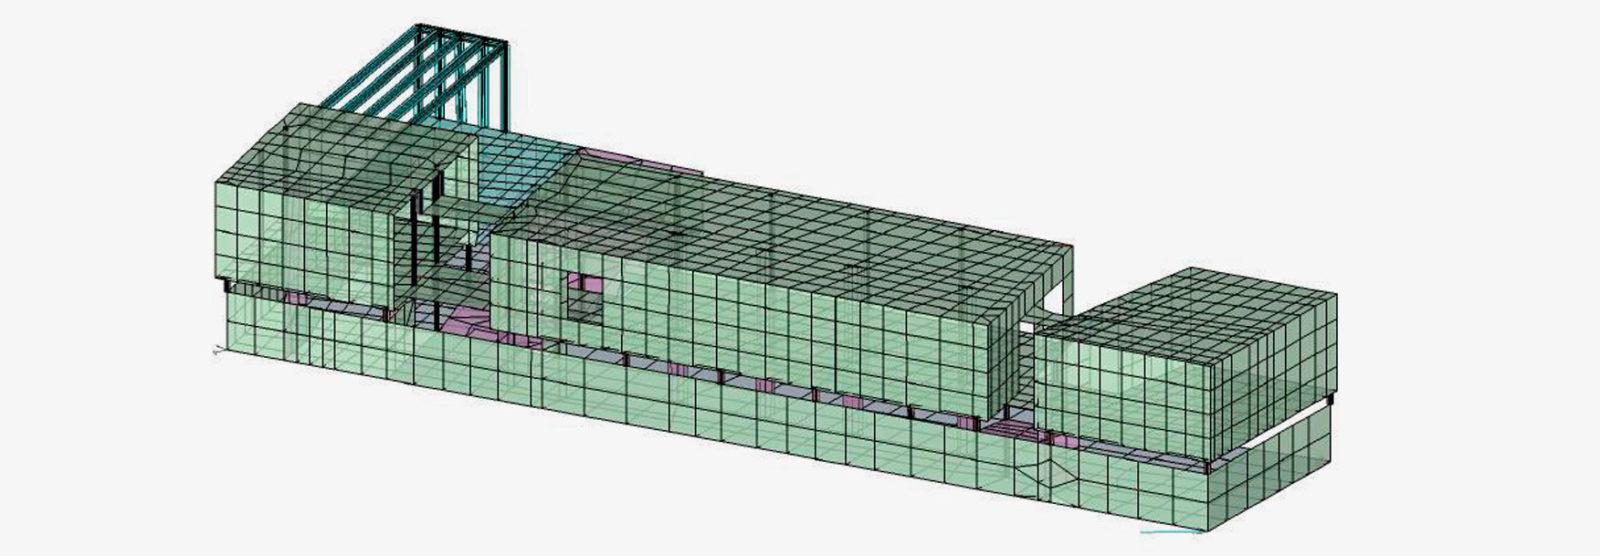 modelo analito de calculo Mecanismo-Ingenieria-Biblioteca-Manuel-Altoaguirre_Castroferro